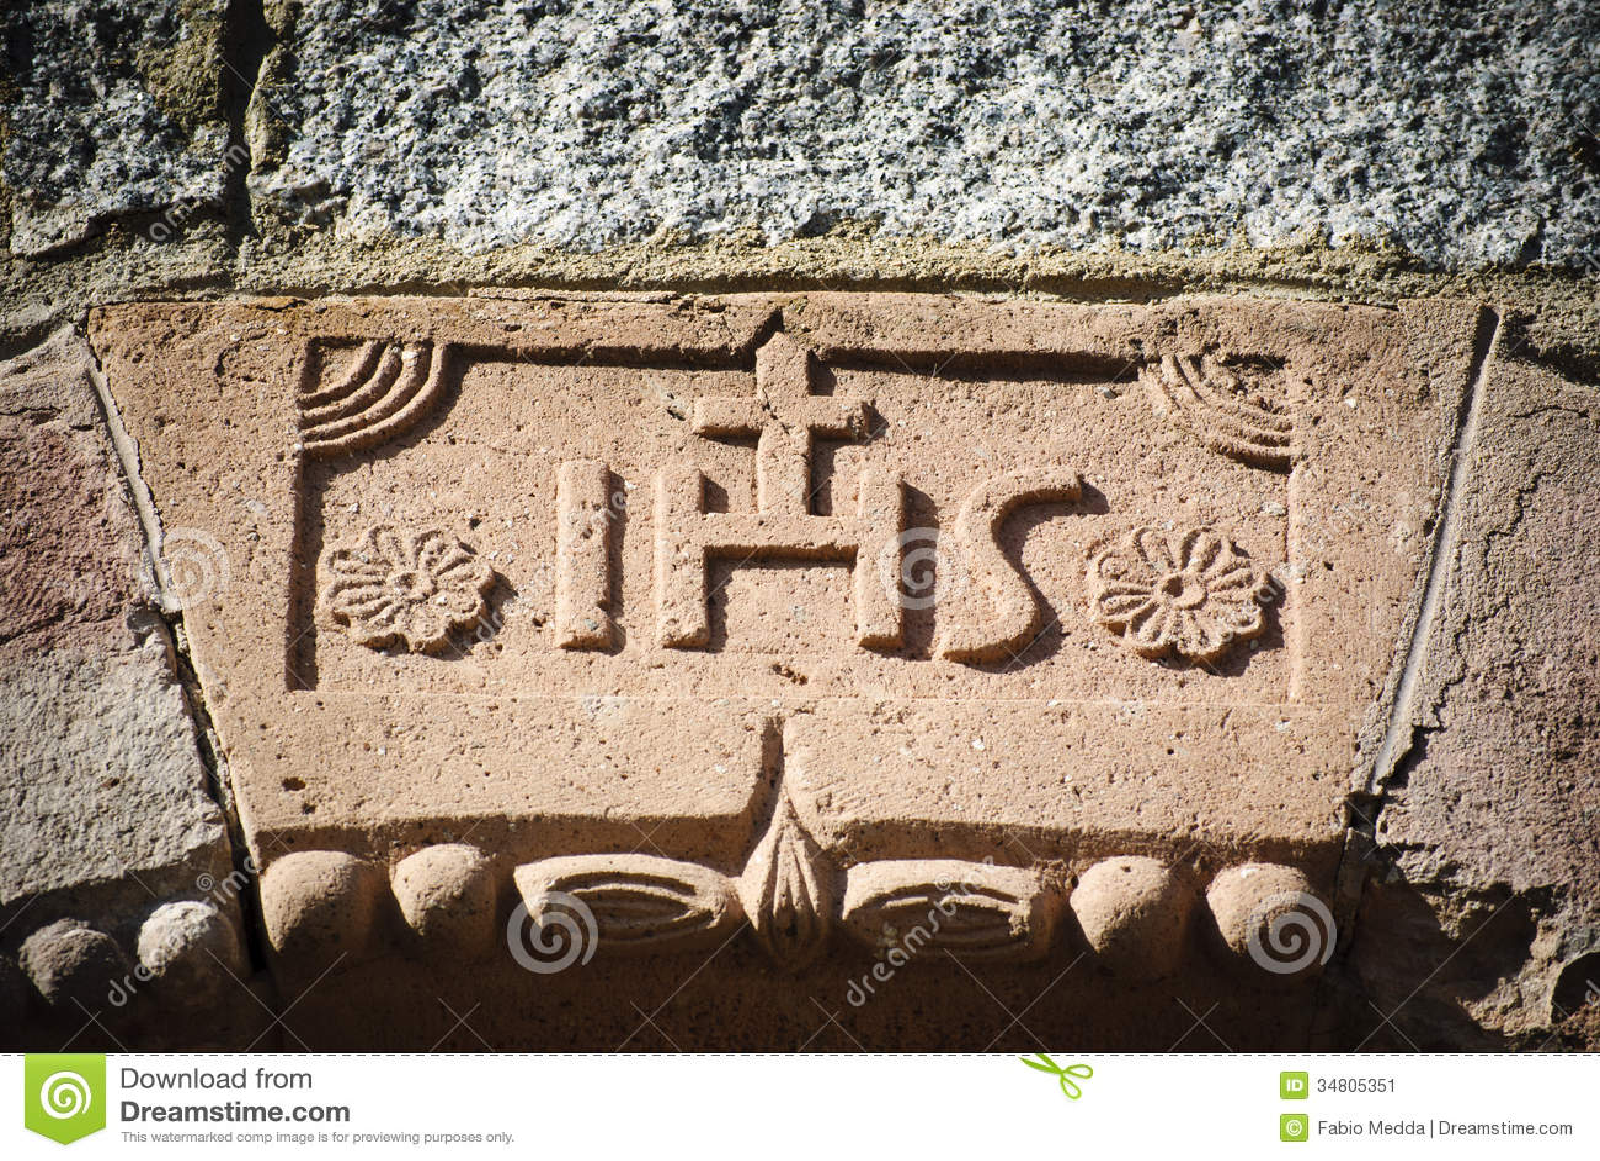 Sardinia.Inscription einer Kirche